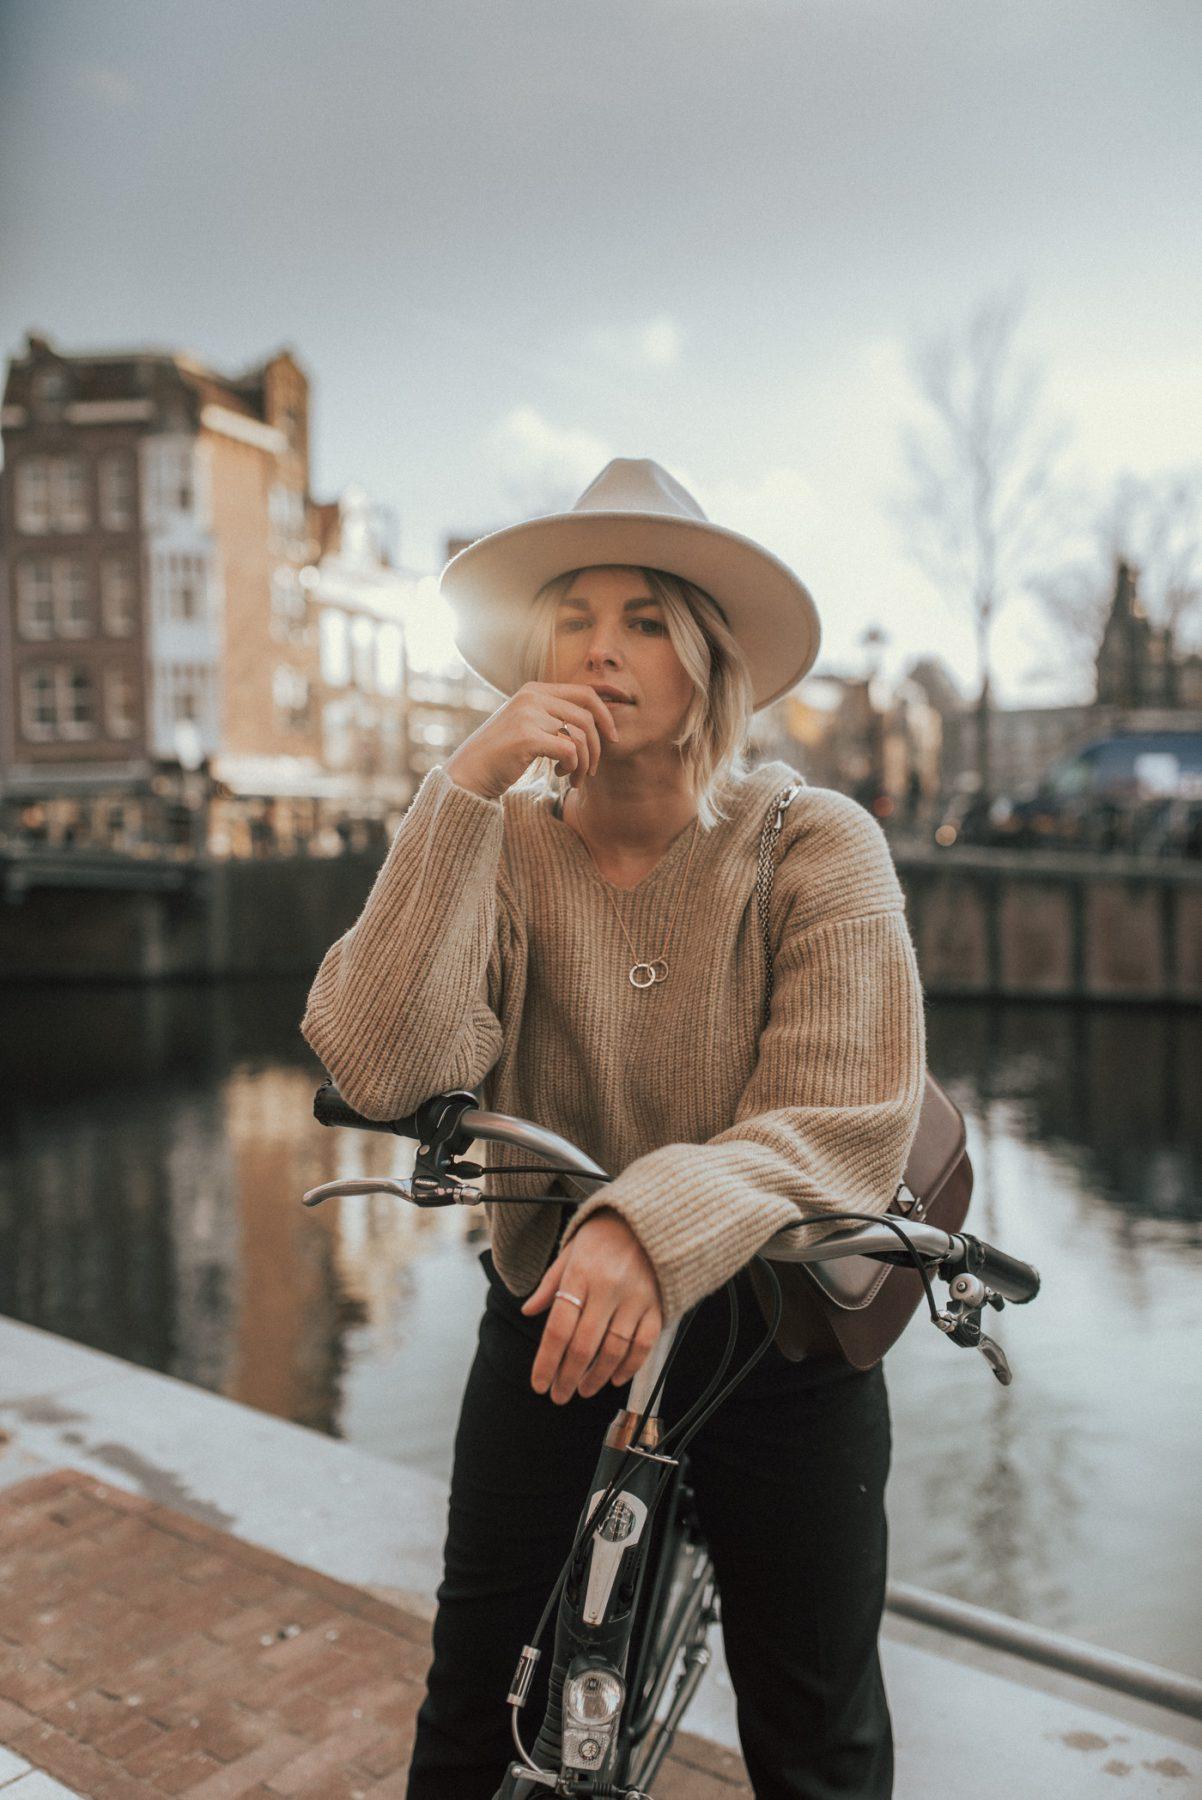 amsterdam-outfit-diary-sthomas-sabo-necklace-H&M-oversize-sweater-modeblog-alinekaplan.com